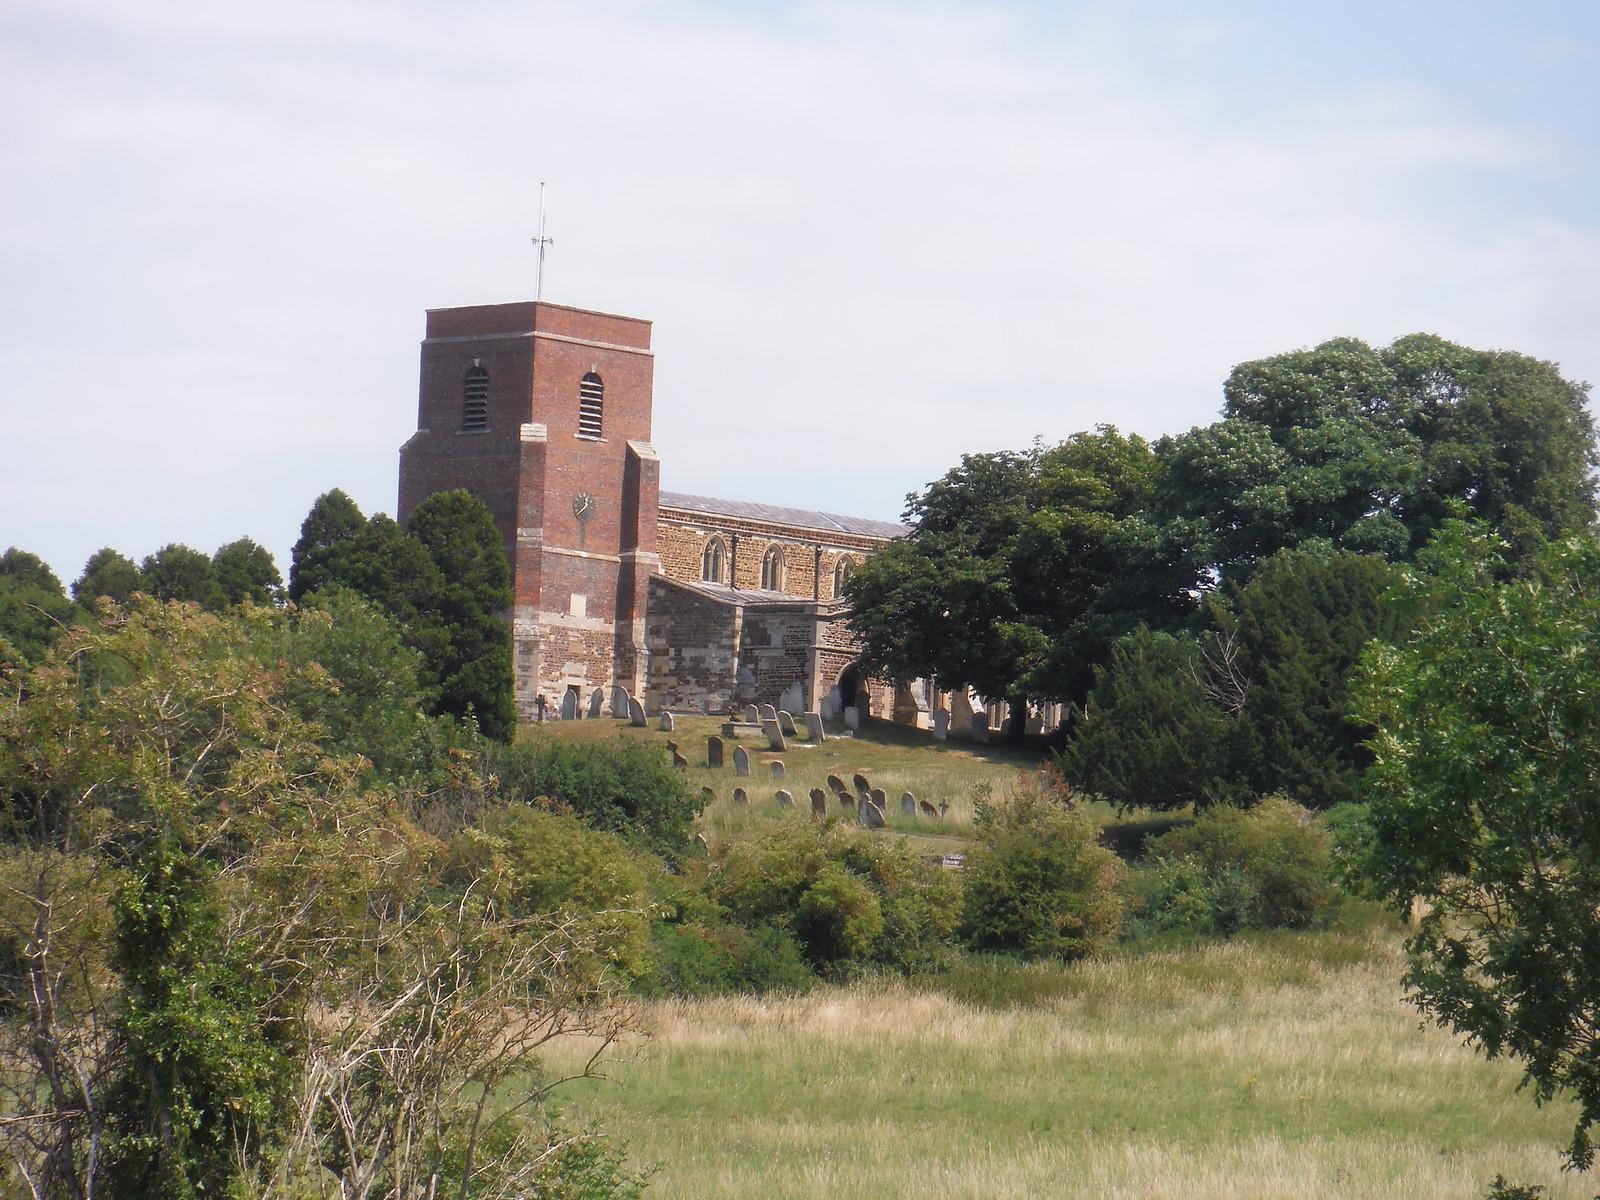 All Saints' Church, Shillington, from footpath SWC Walk 233 - Arlesey to Letchworth Garden City